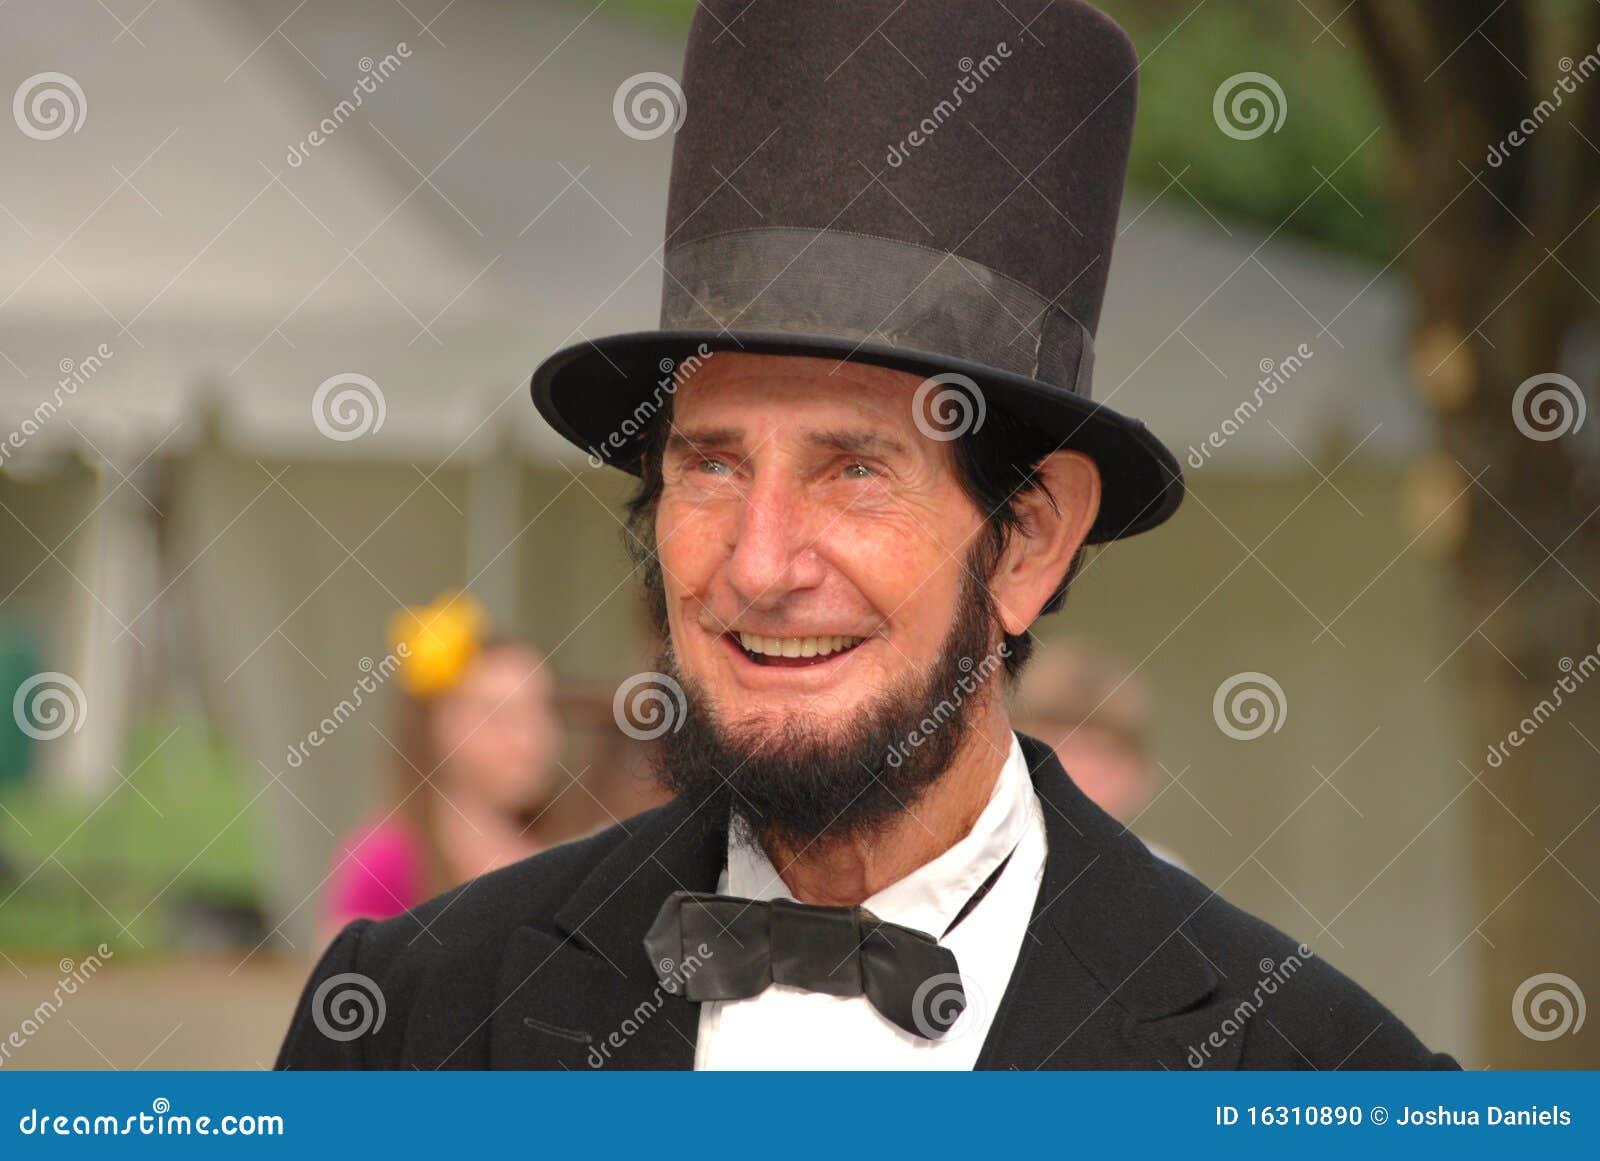 Sonrisa De Abraham Lincoln Imagen Editorial Imagen 16310890